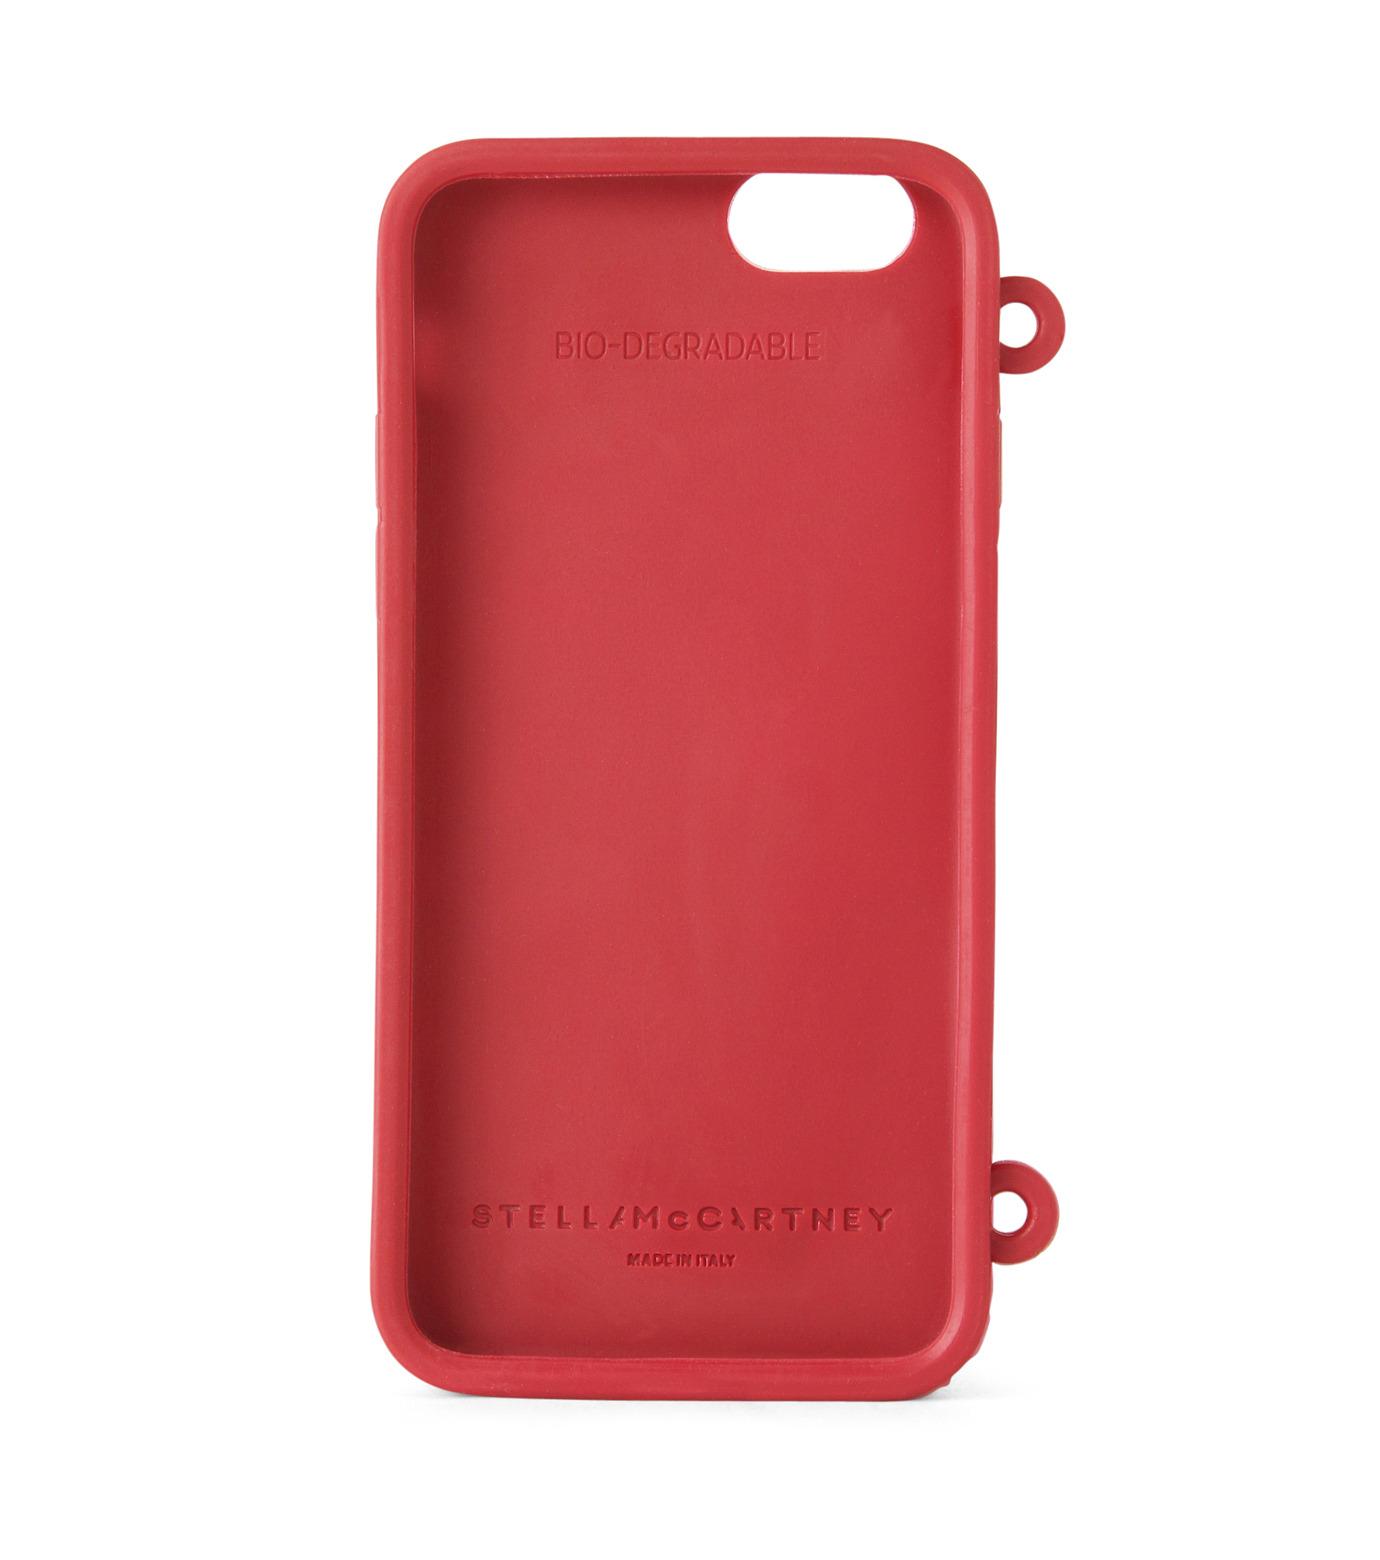 Stella McCartney(ステラマッカートニー)のiPhone6 Case Stella-PINK(ケースiphone6/6s/case iphone6/6s)-397935-W9589-72 拡大詳細画像2